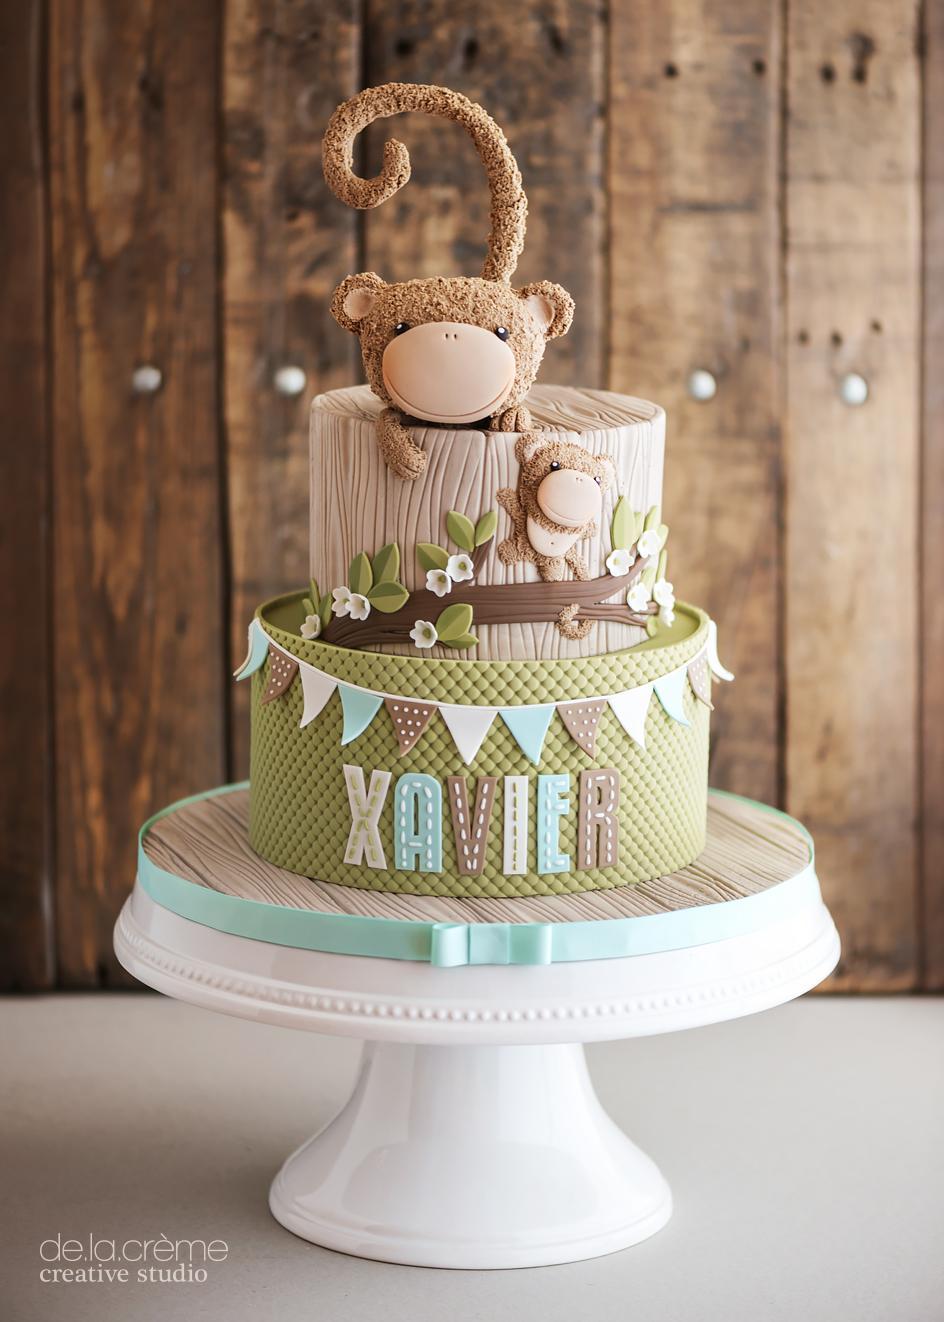 Fuzzy Monkey Birthday Cake De La Cr 232 Me Creative Studio